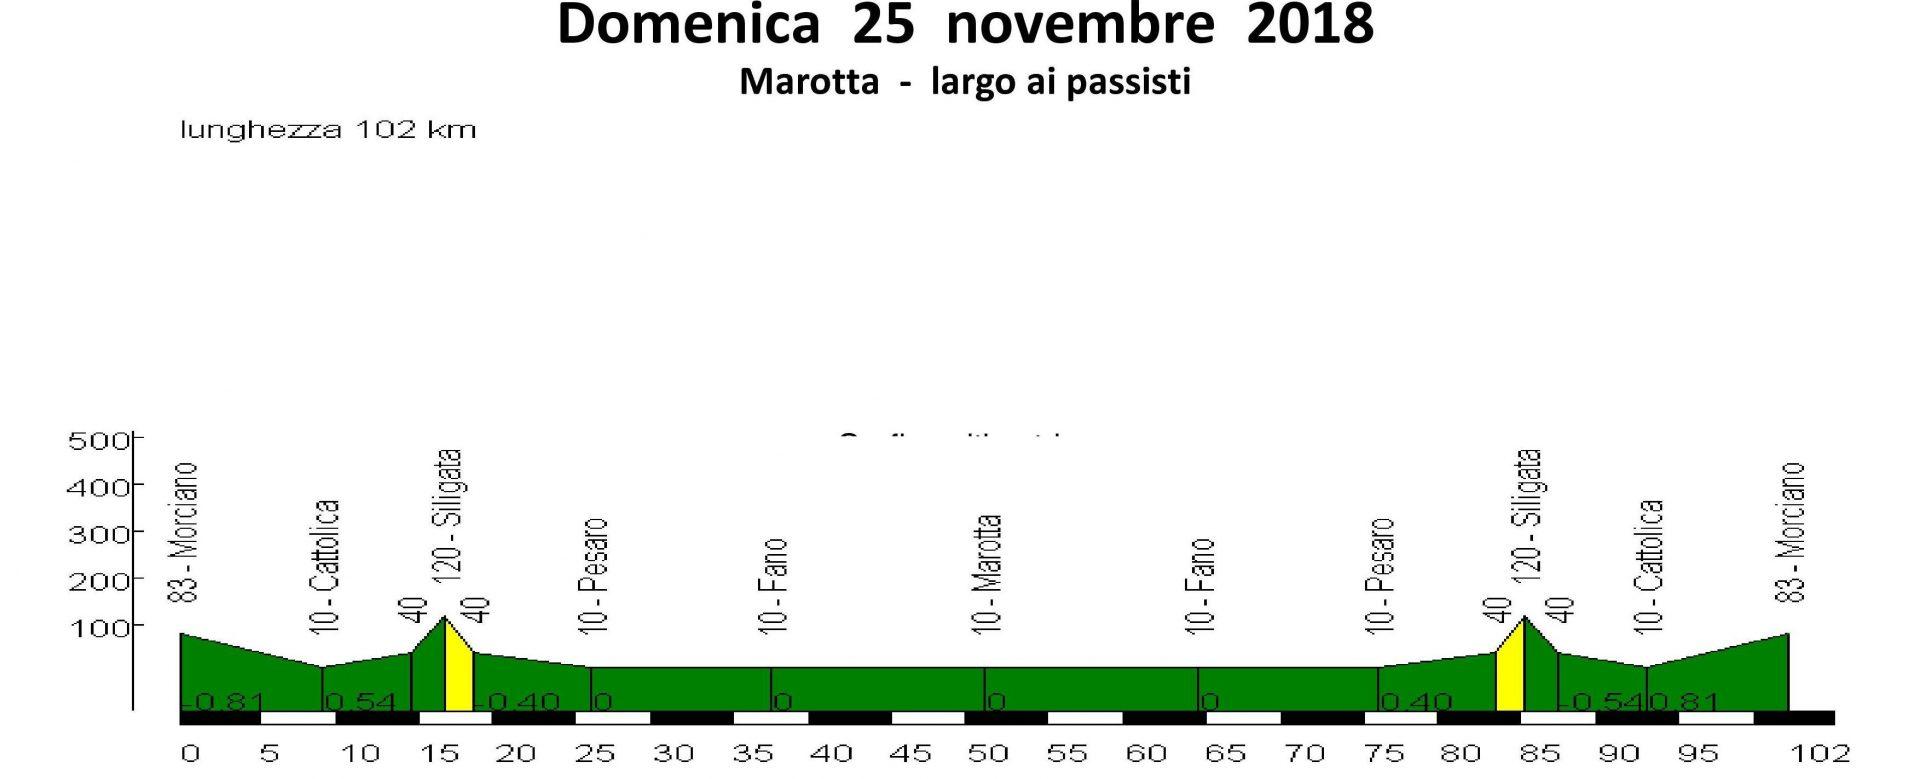 Domenica 25-nov-2018 Marotta